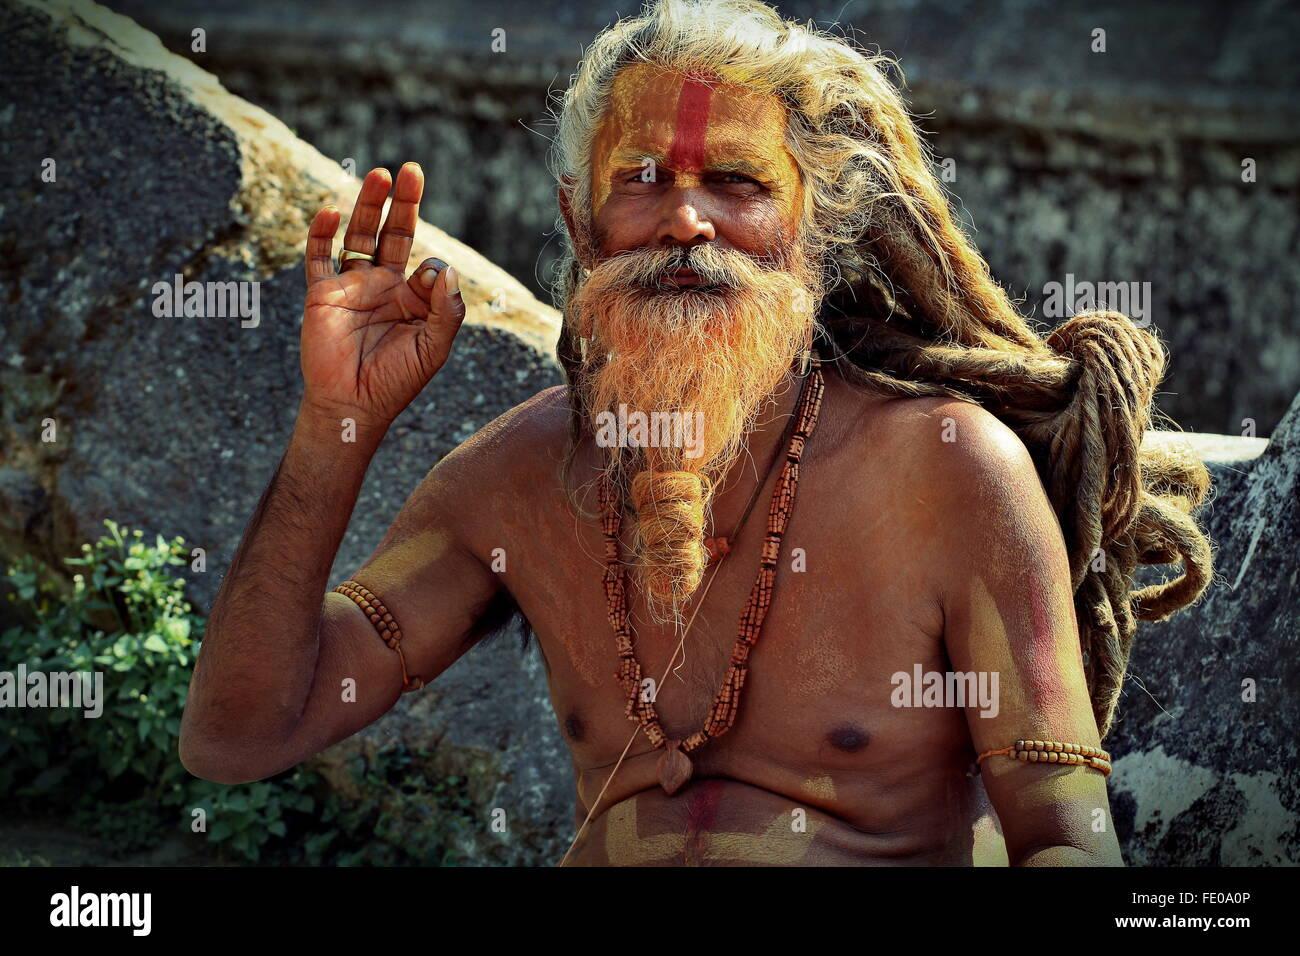 Sadhu or Holy Man in Pashupatinath temple in Kathmandu Valley, Nepal - Stock Image